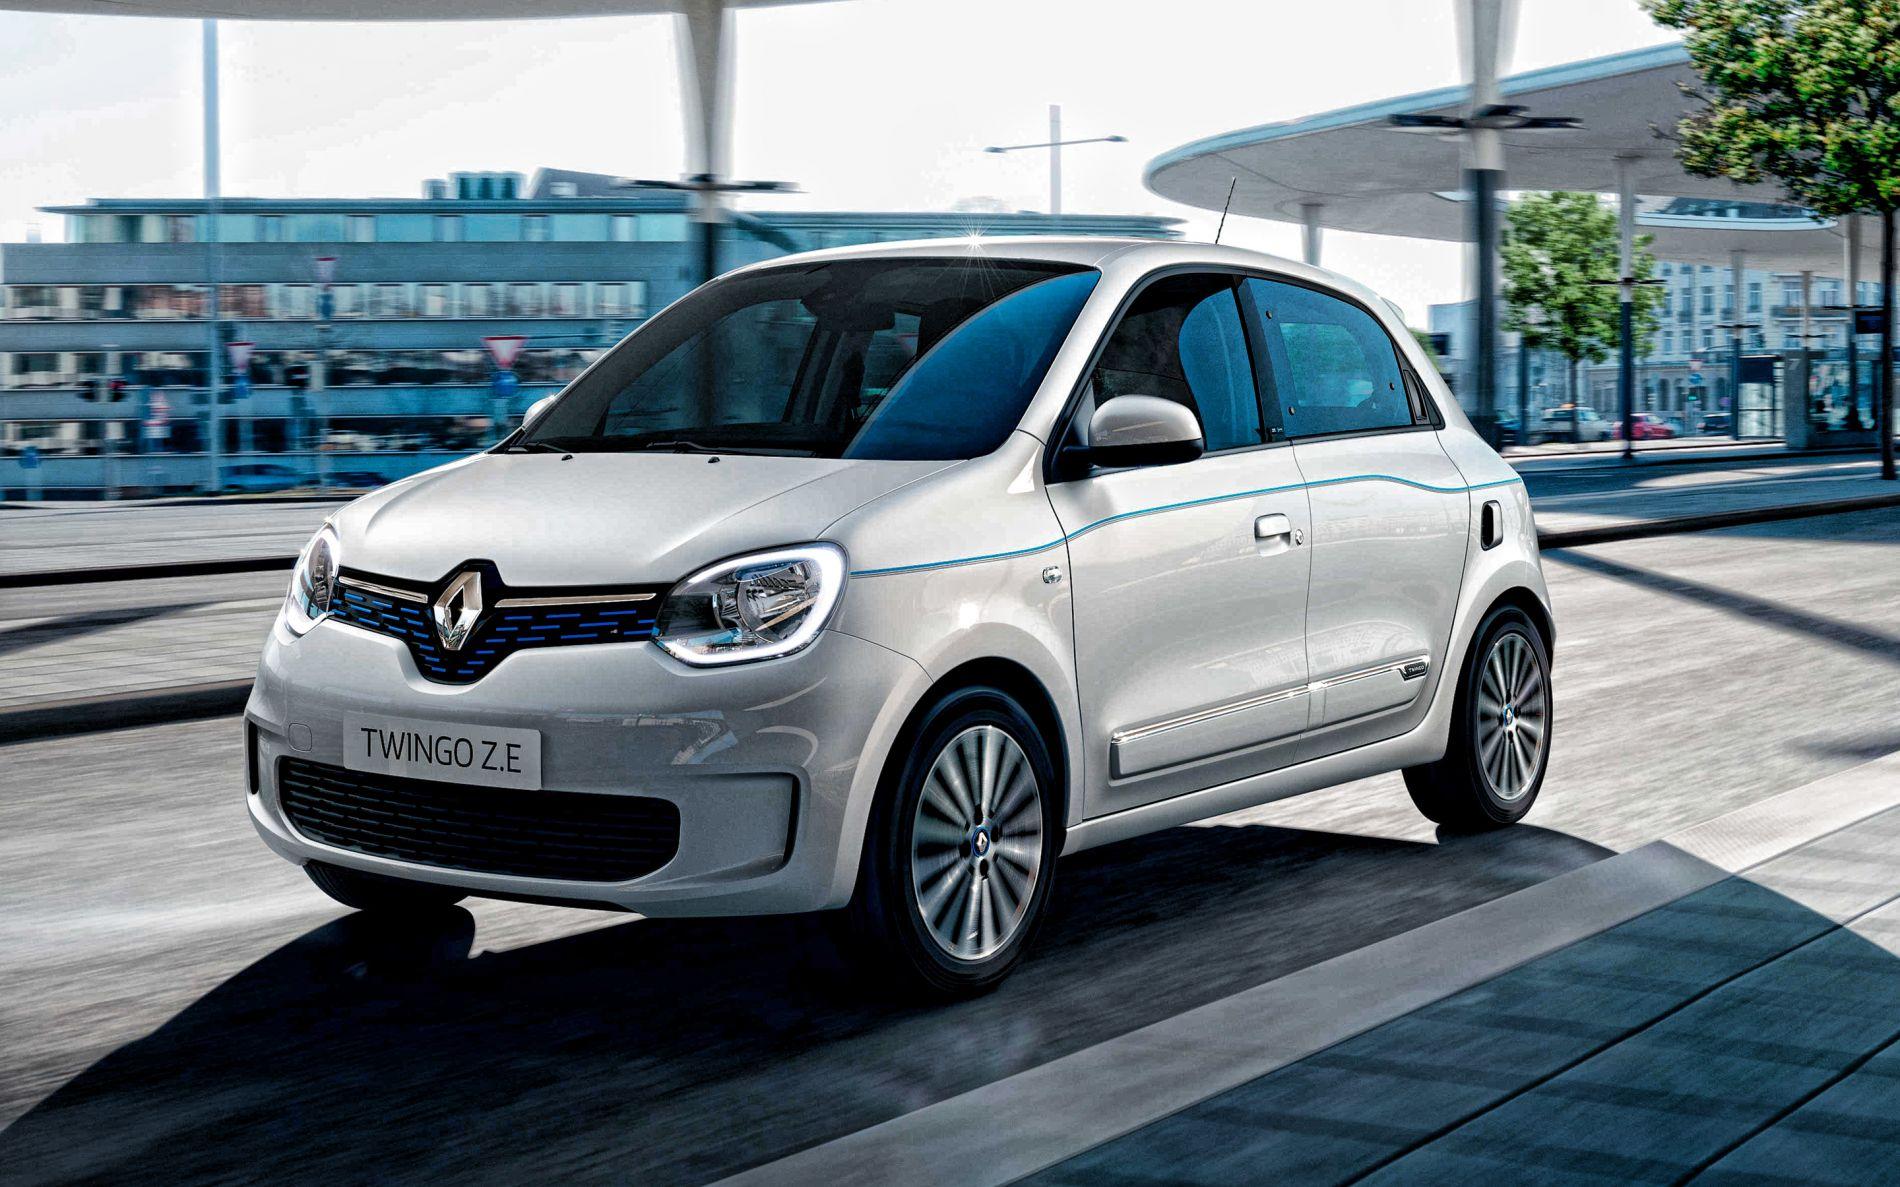 2020 Renault Twingo Z.E. - ფრანგული ეკო მობილი